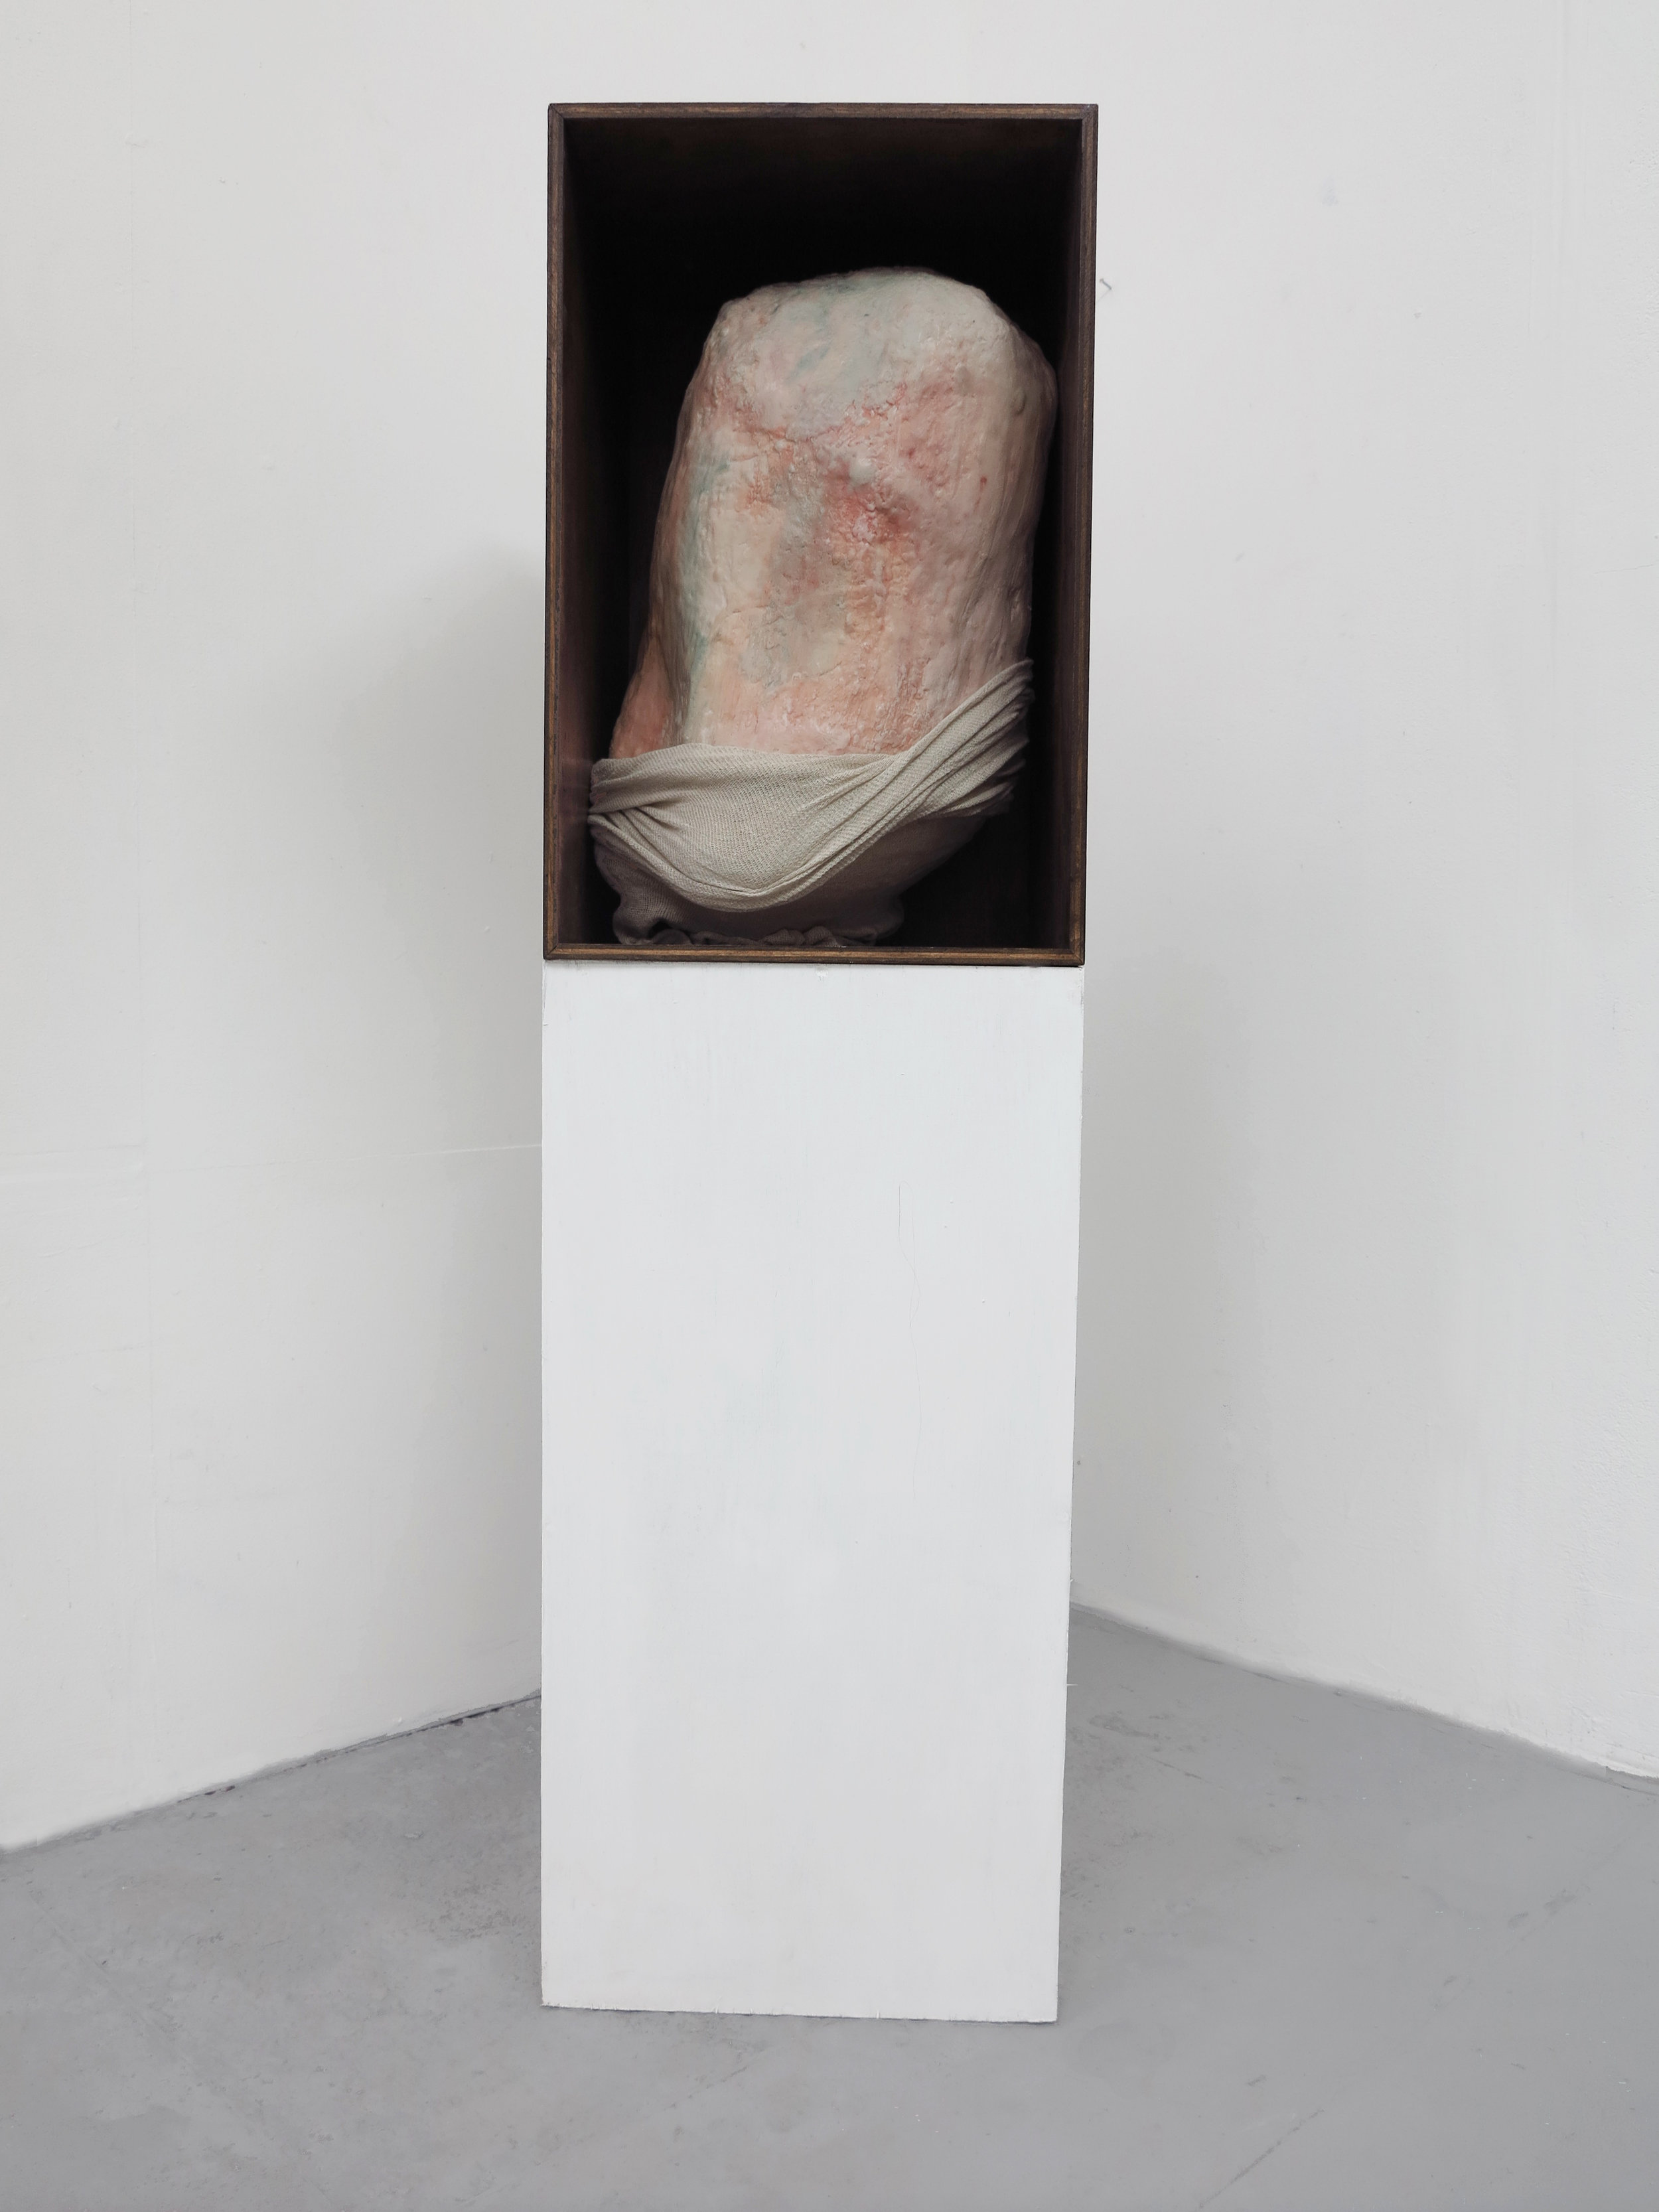 Sarcophagus, 2017